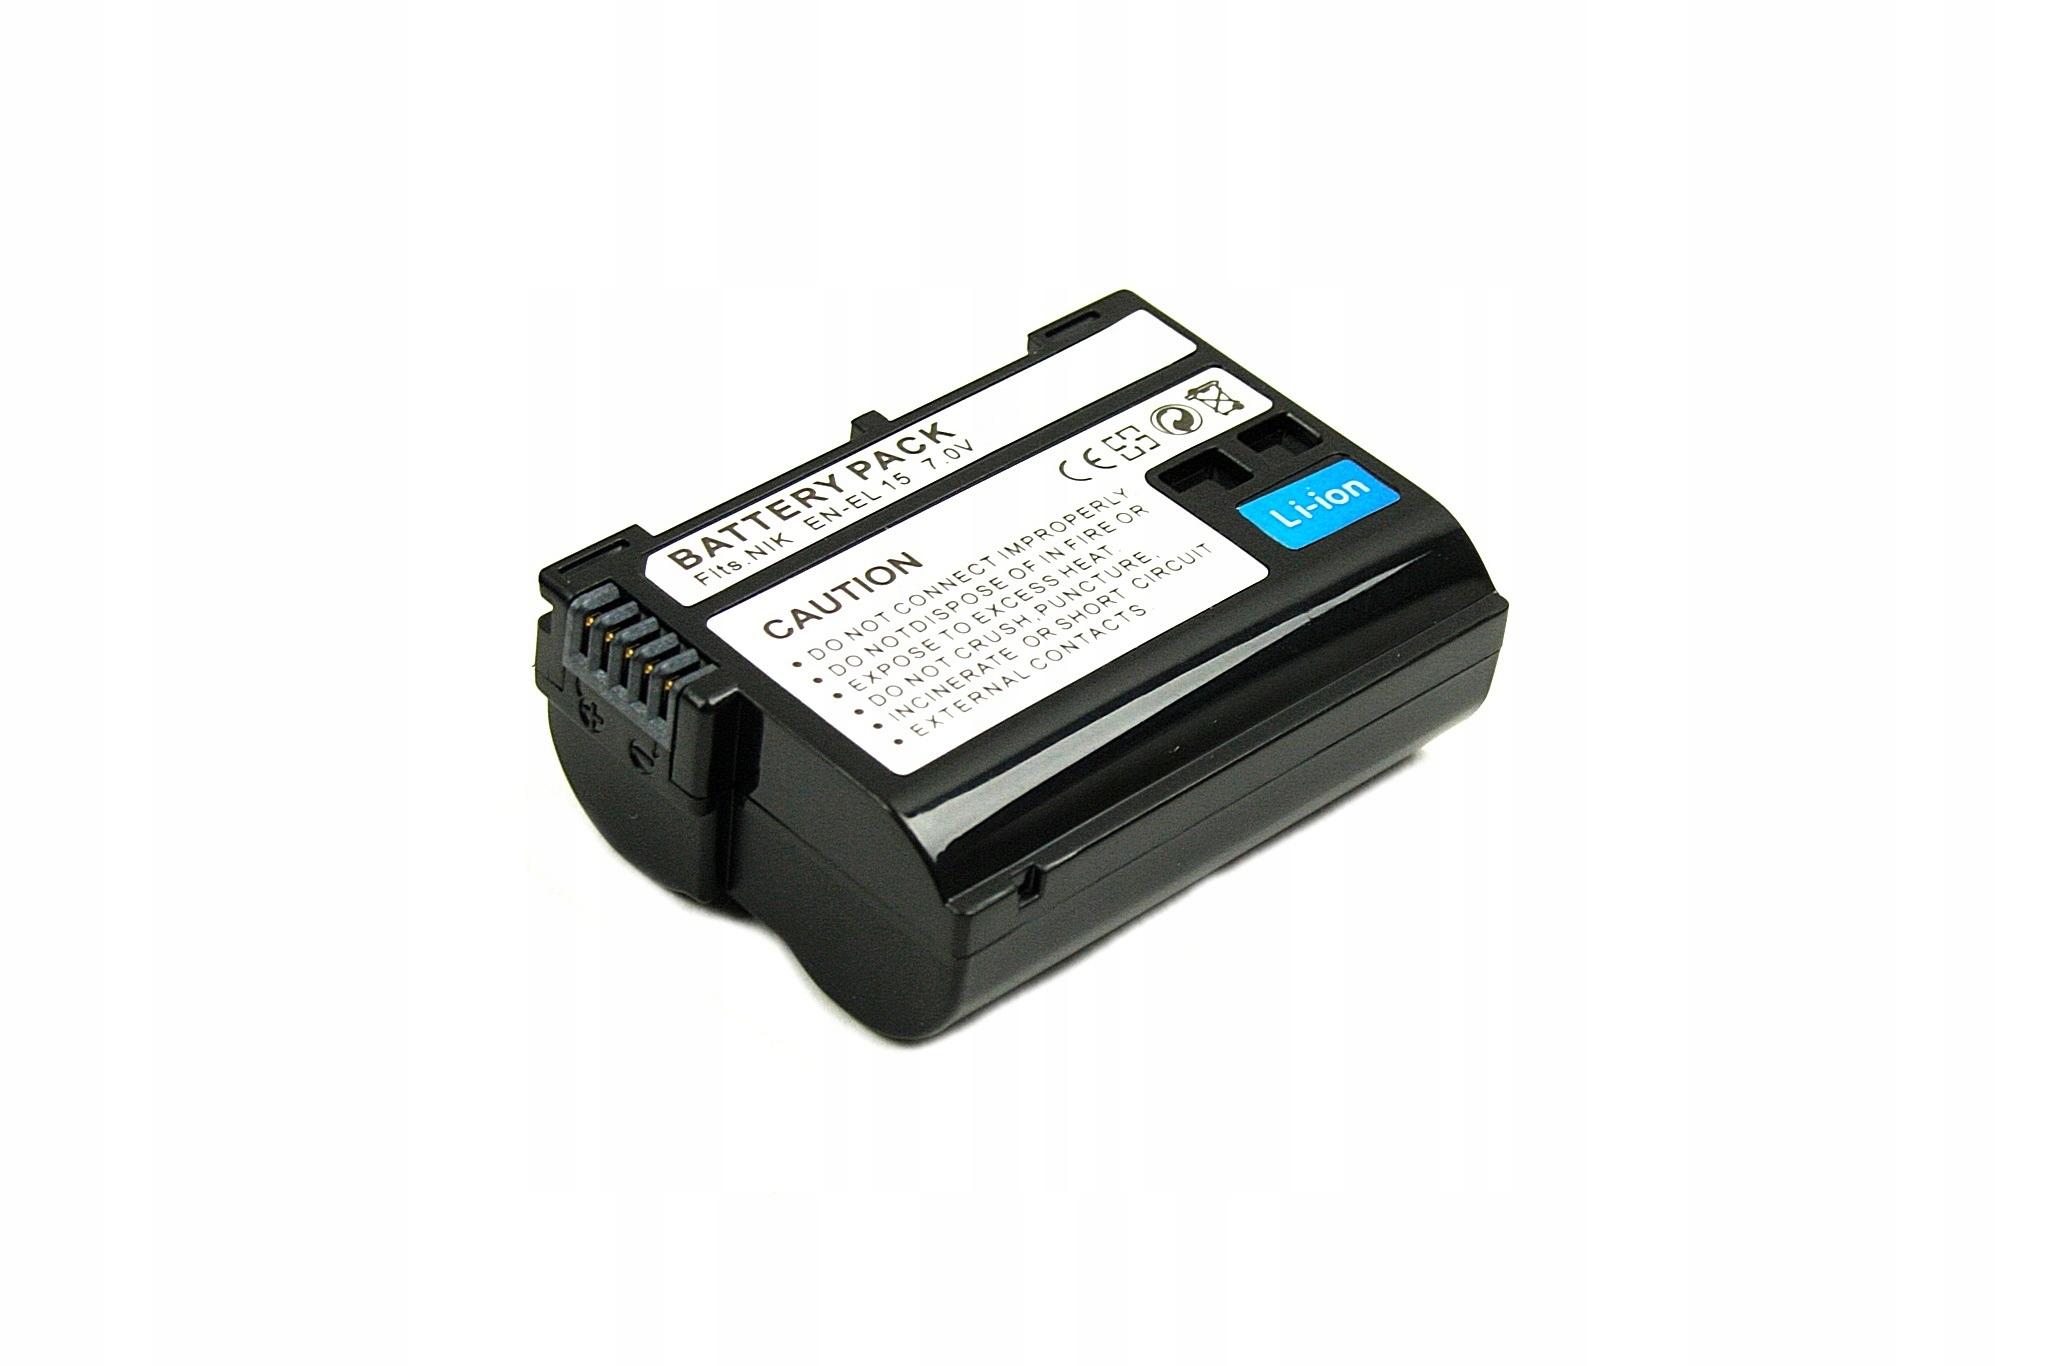 BATERIA AKUMULATOR NIKON D600 D800E D7000 D7100 EN-EL15 - Baterie do aparatów cyfrowych